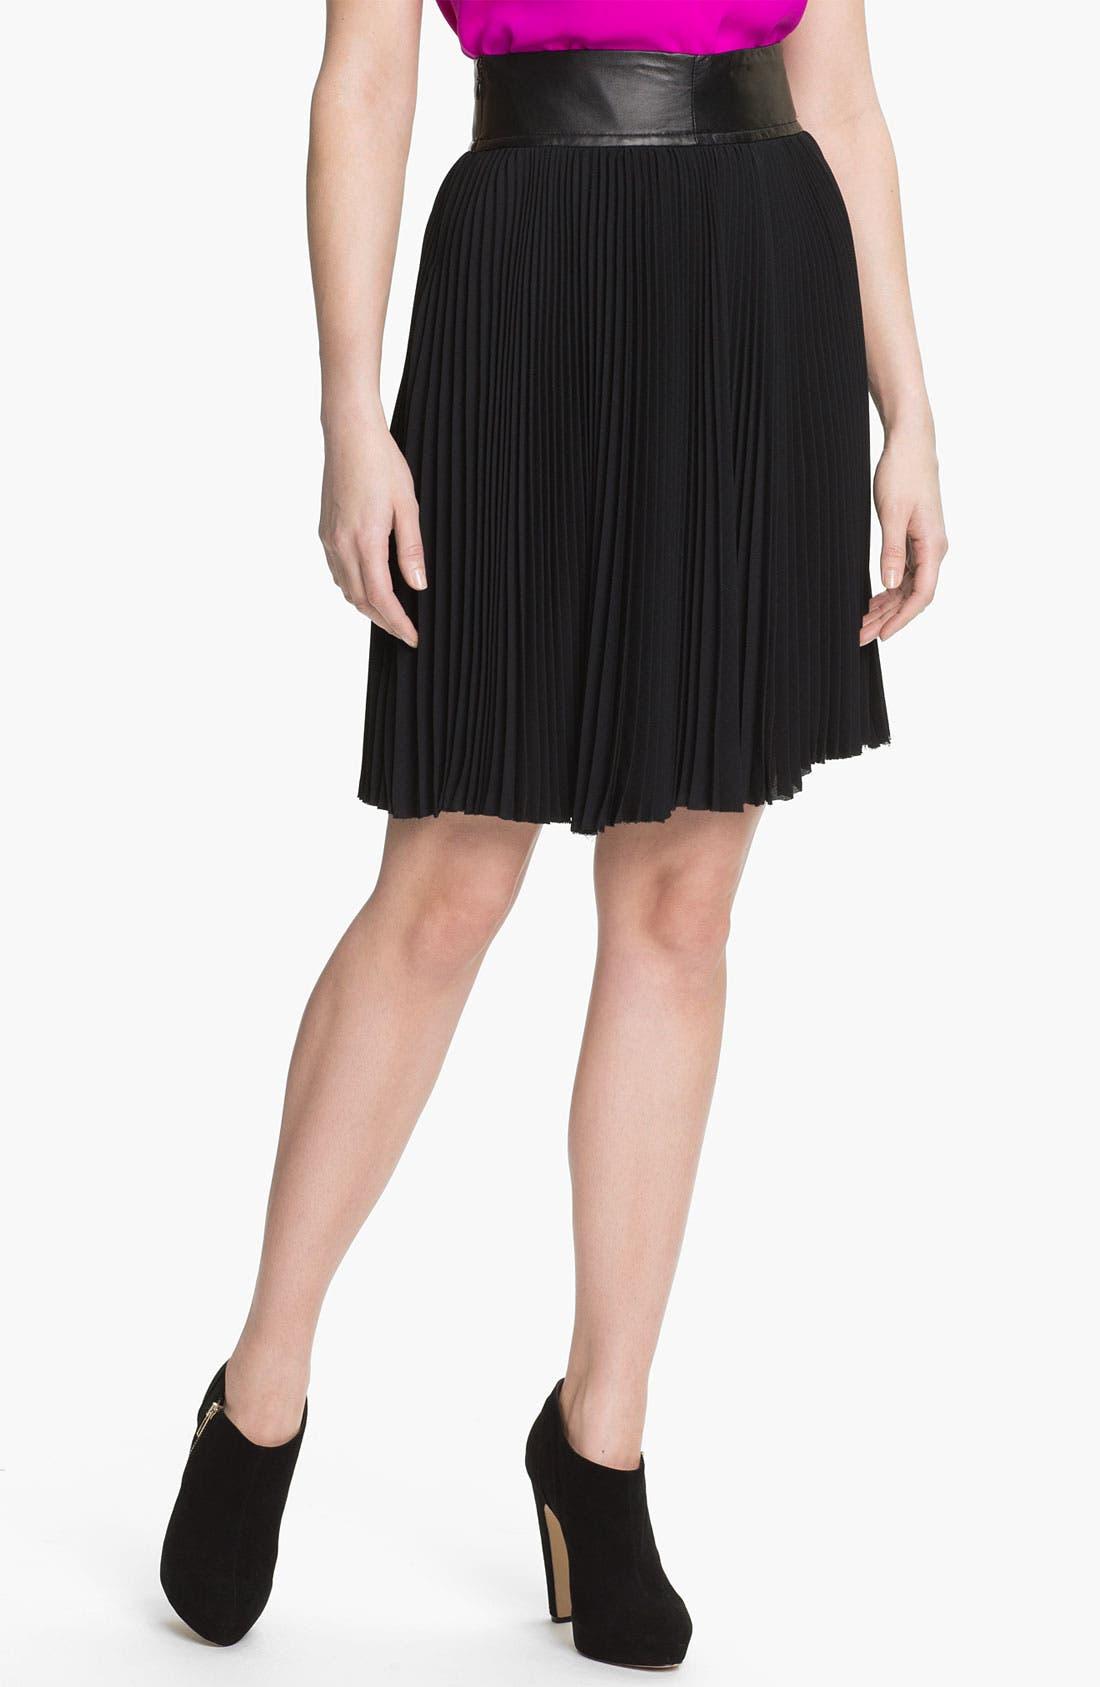 Alternate Image 1 Selected - Diane von Furstenberg 'Panyin' Skirt